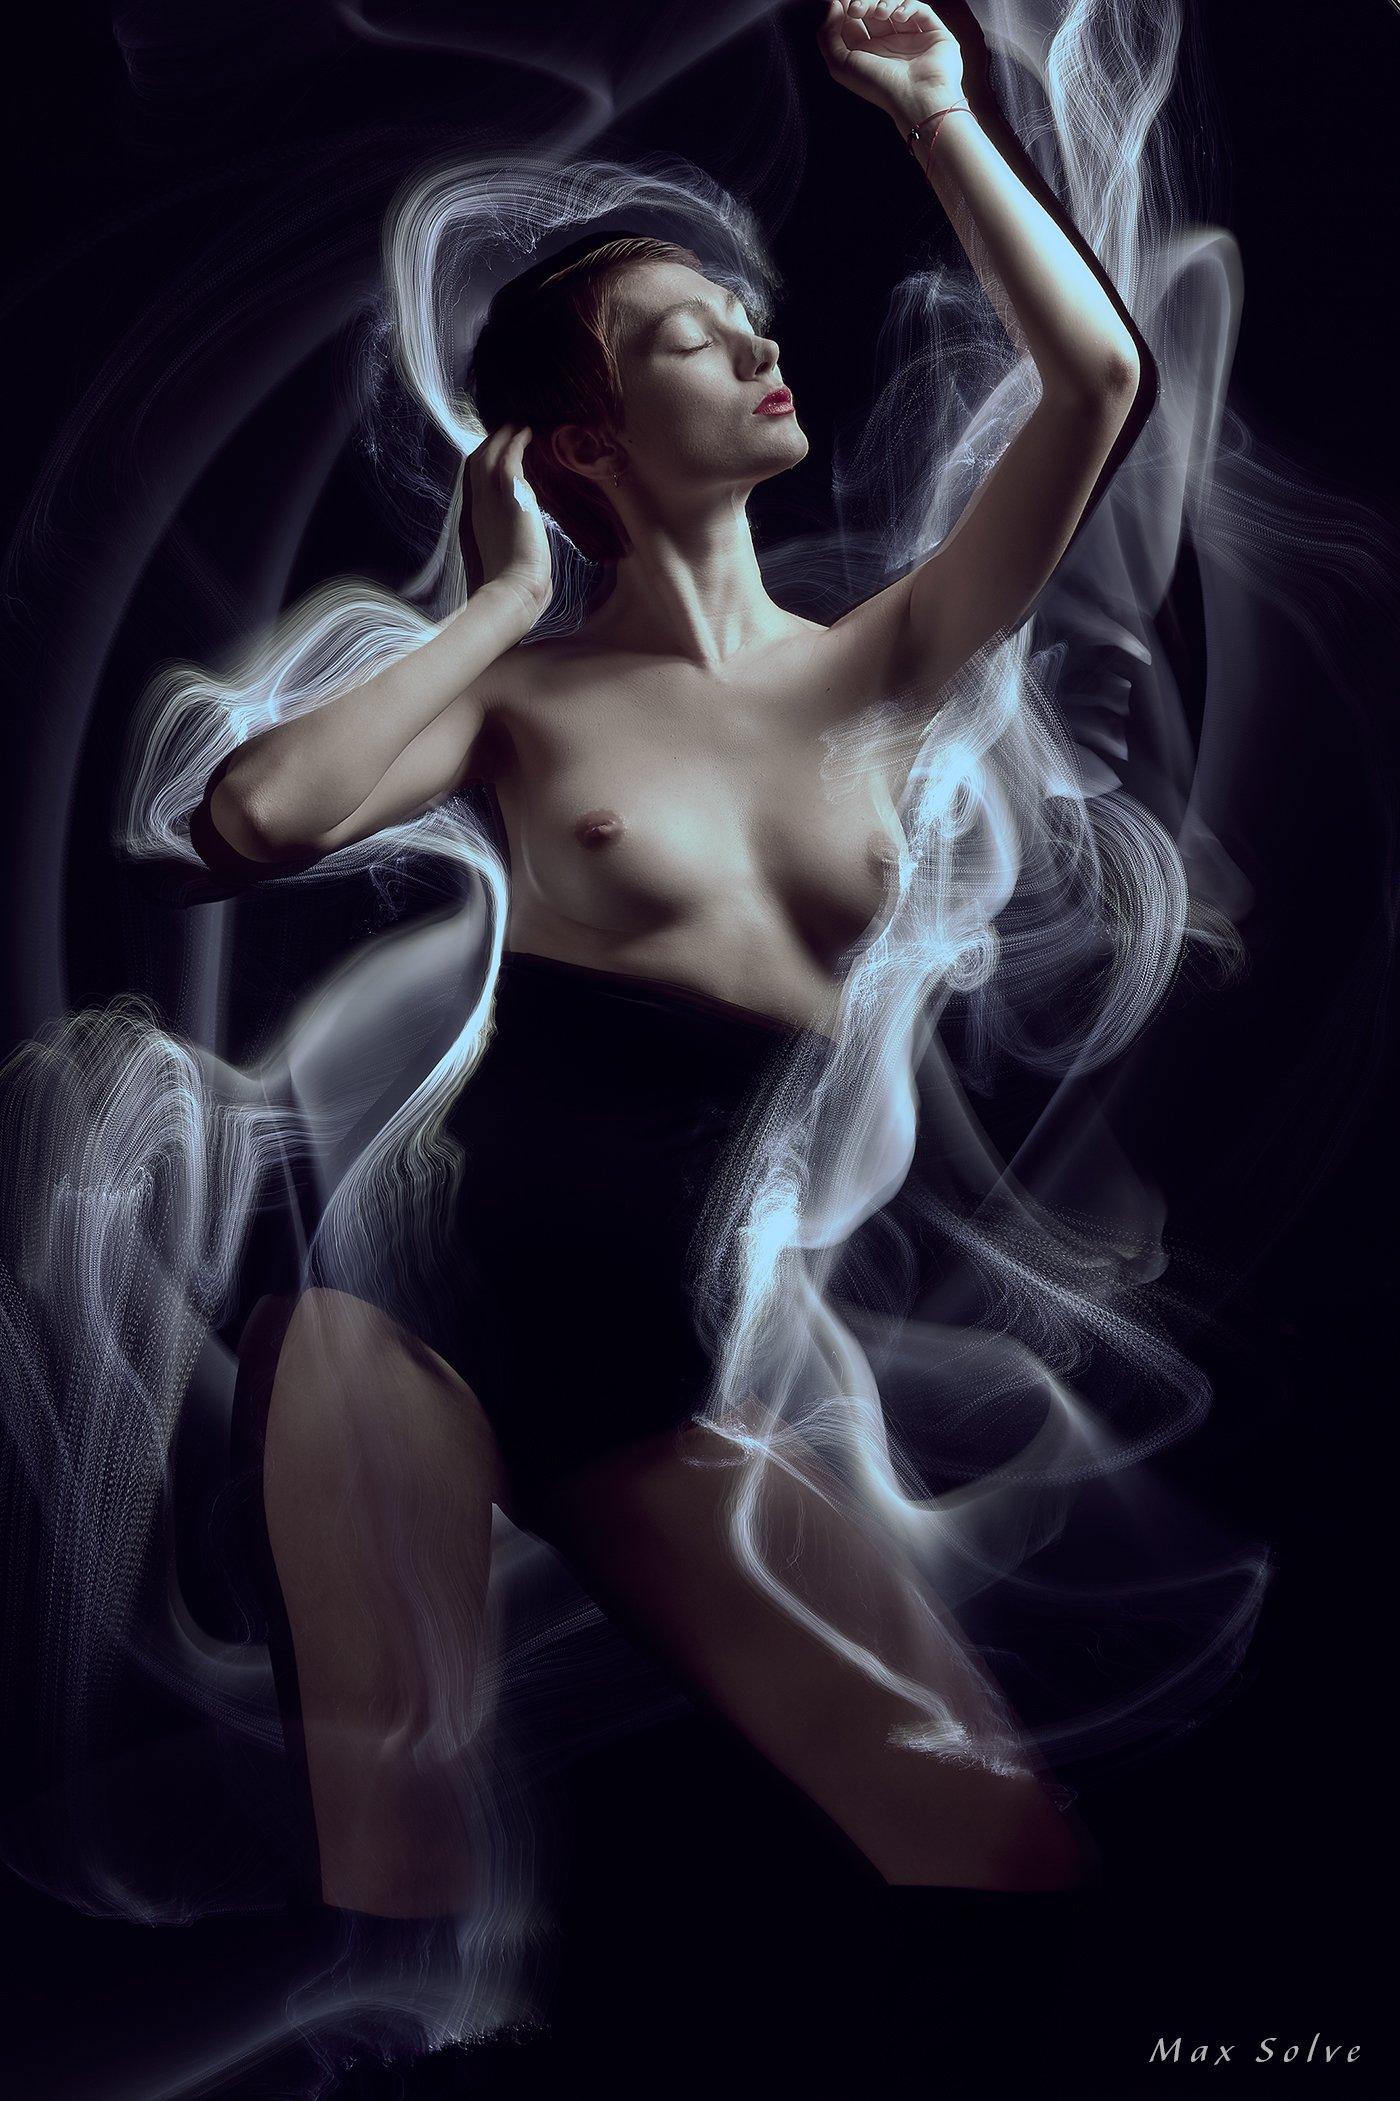 ню, nu, nude, sexy, hot, fineart, studio, portrait, models, beauty, girls, girl, hair, девушка, студия, портрет, art, , Max Solve